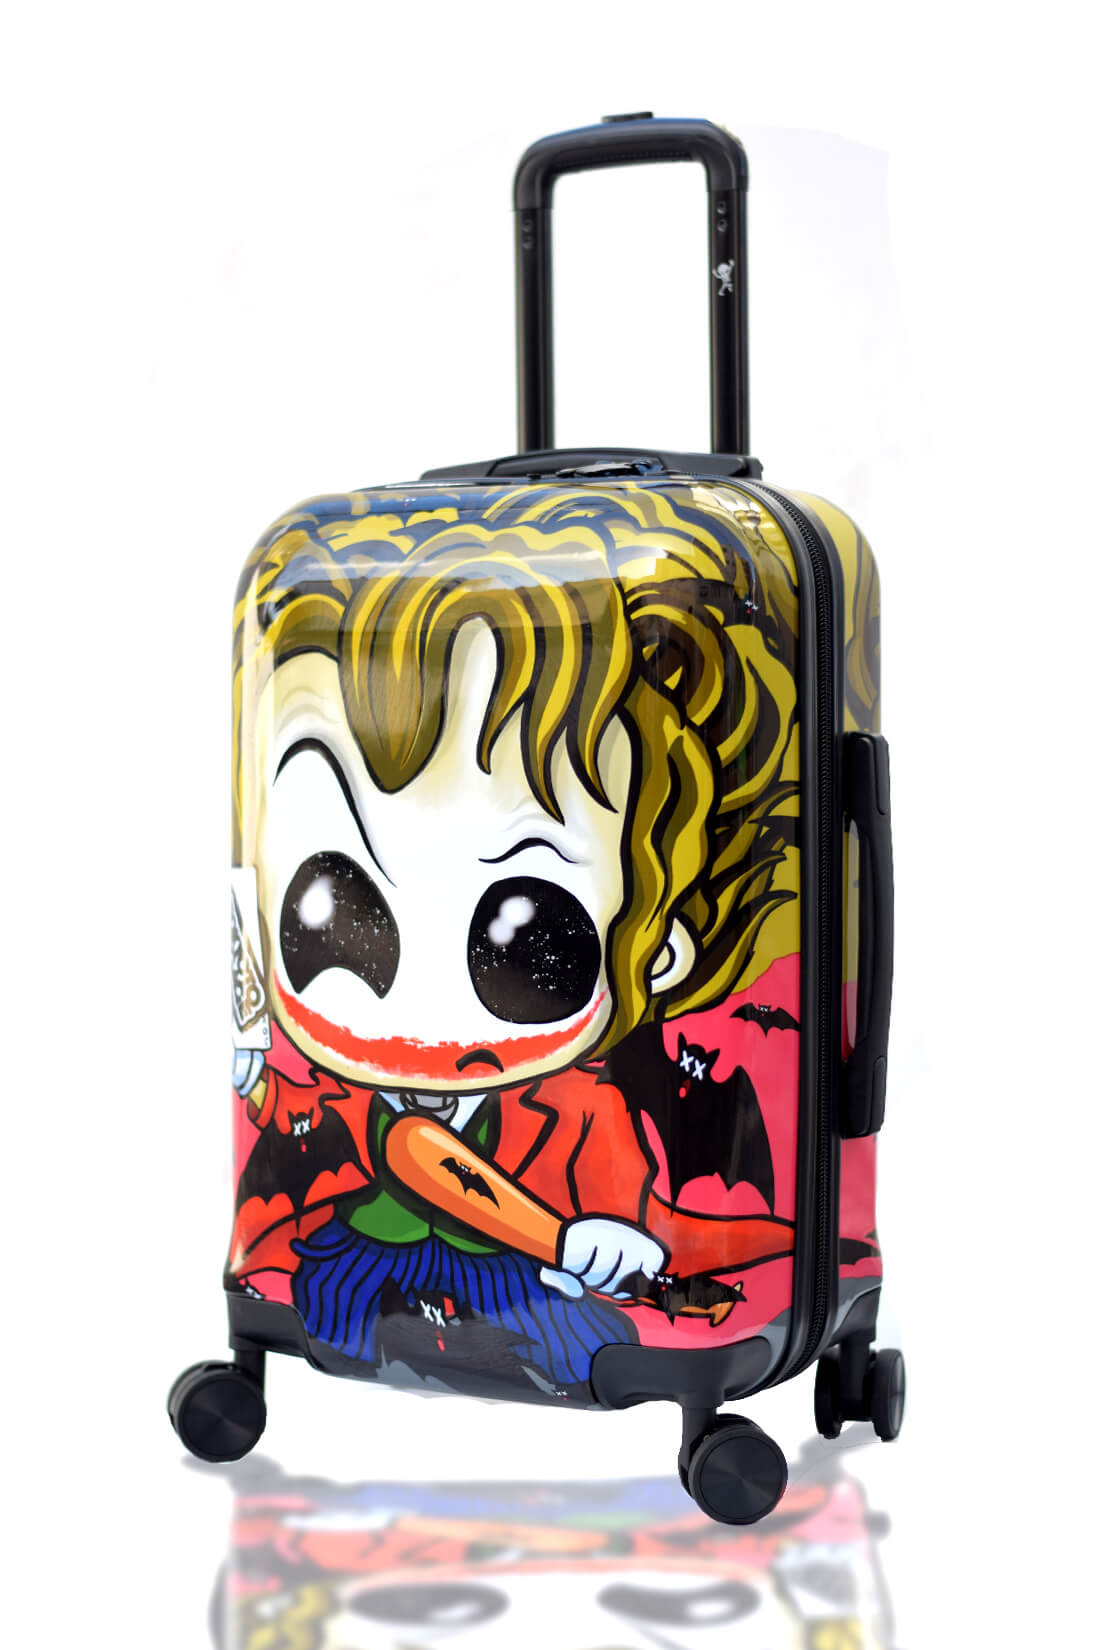 JOKER Hand Cabin Luggage Kids Rigid Carry-on TOKYOTO LUGGAGE 1